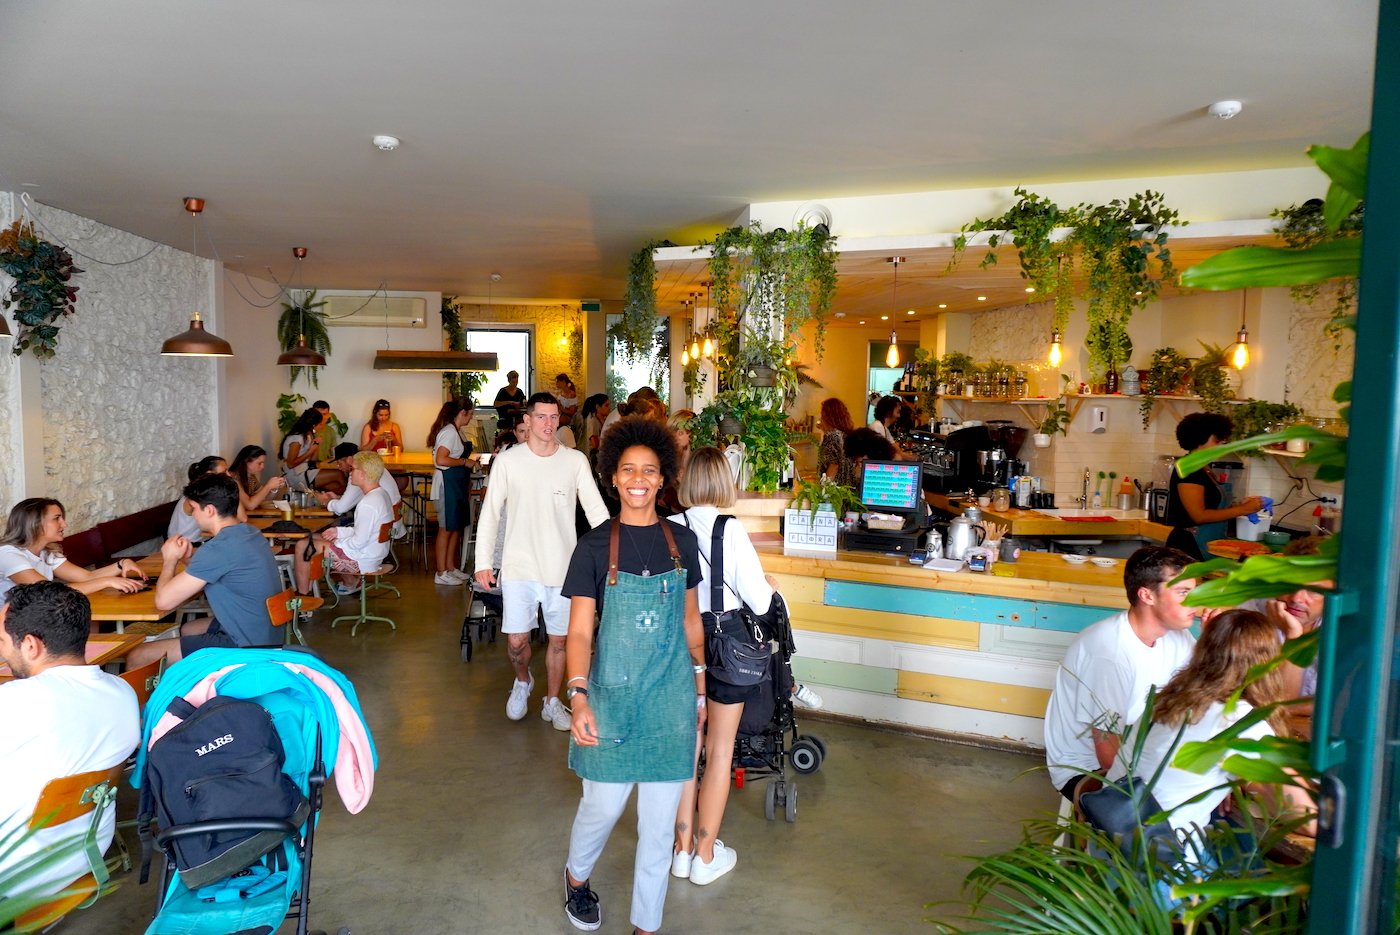 Fauna & Flora, Café in Lisbon